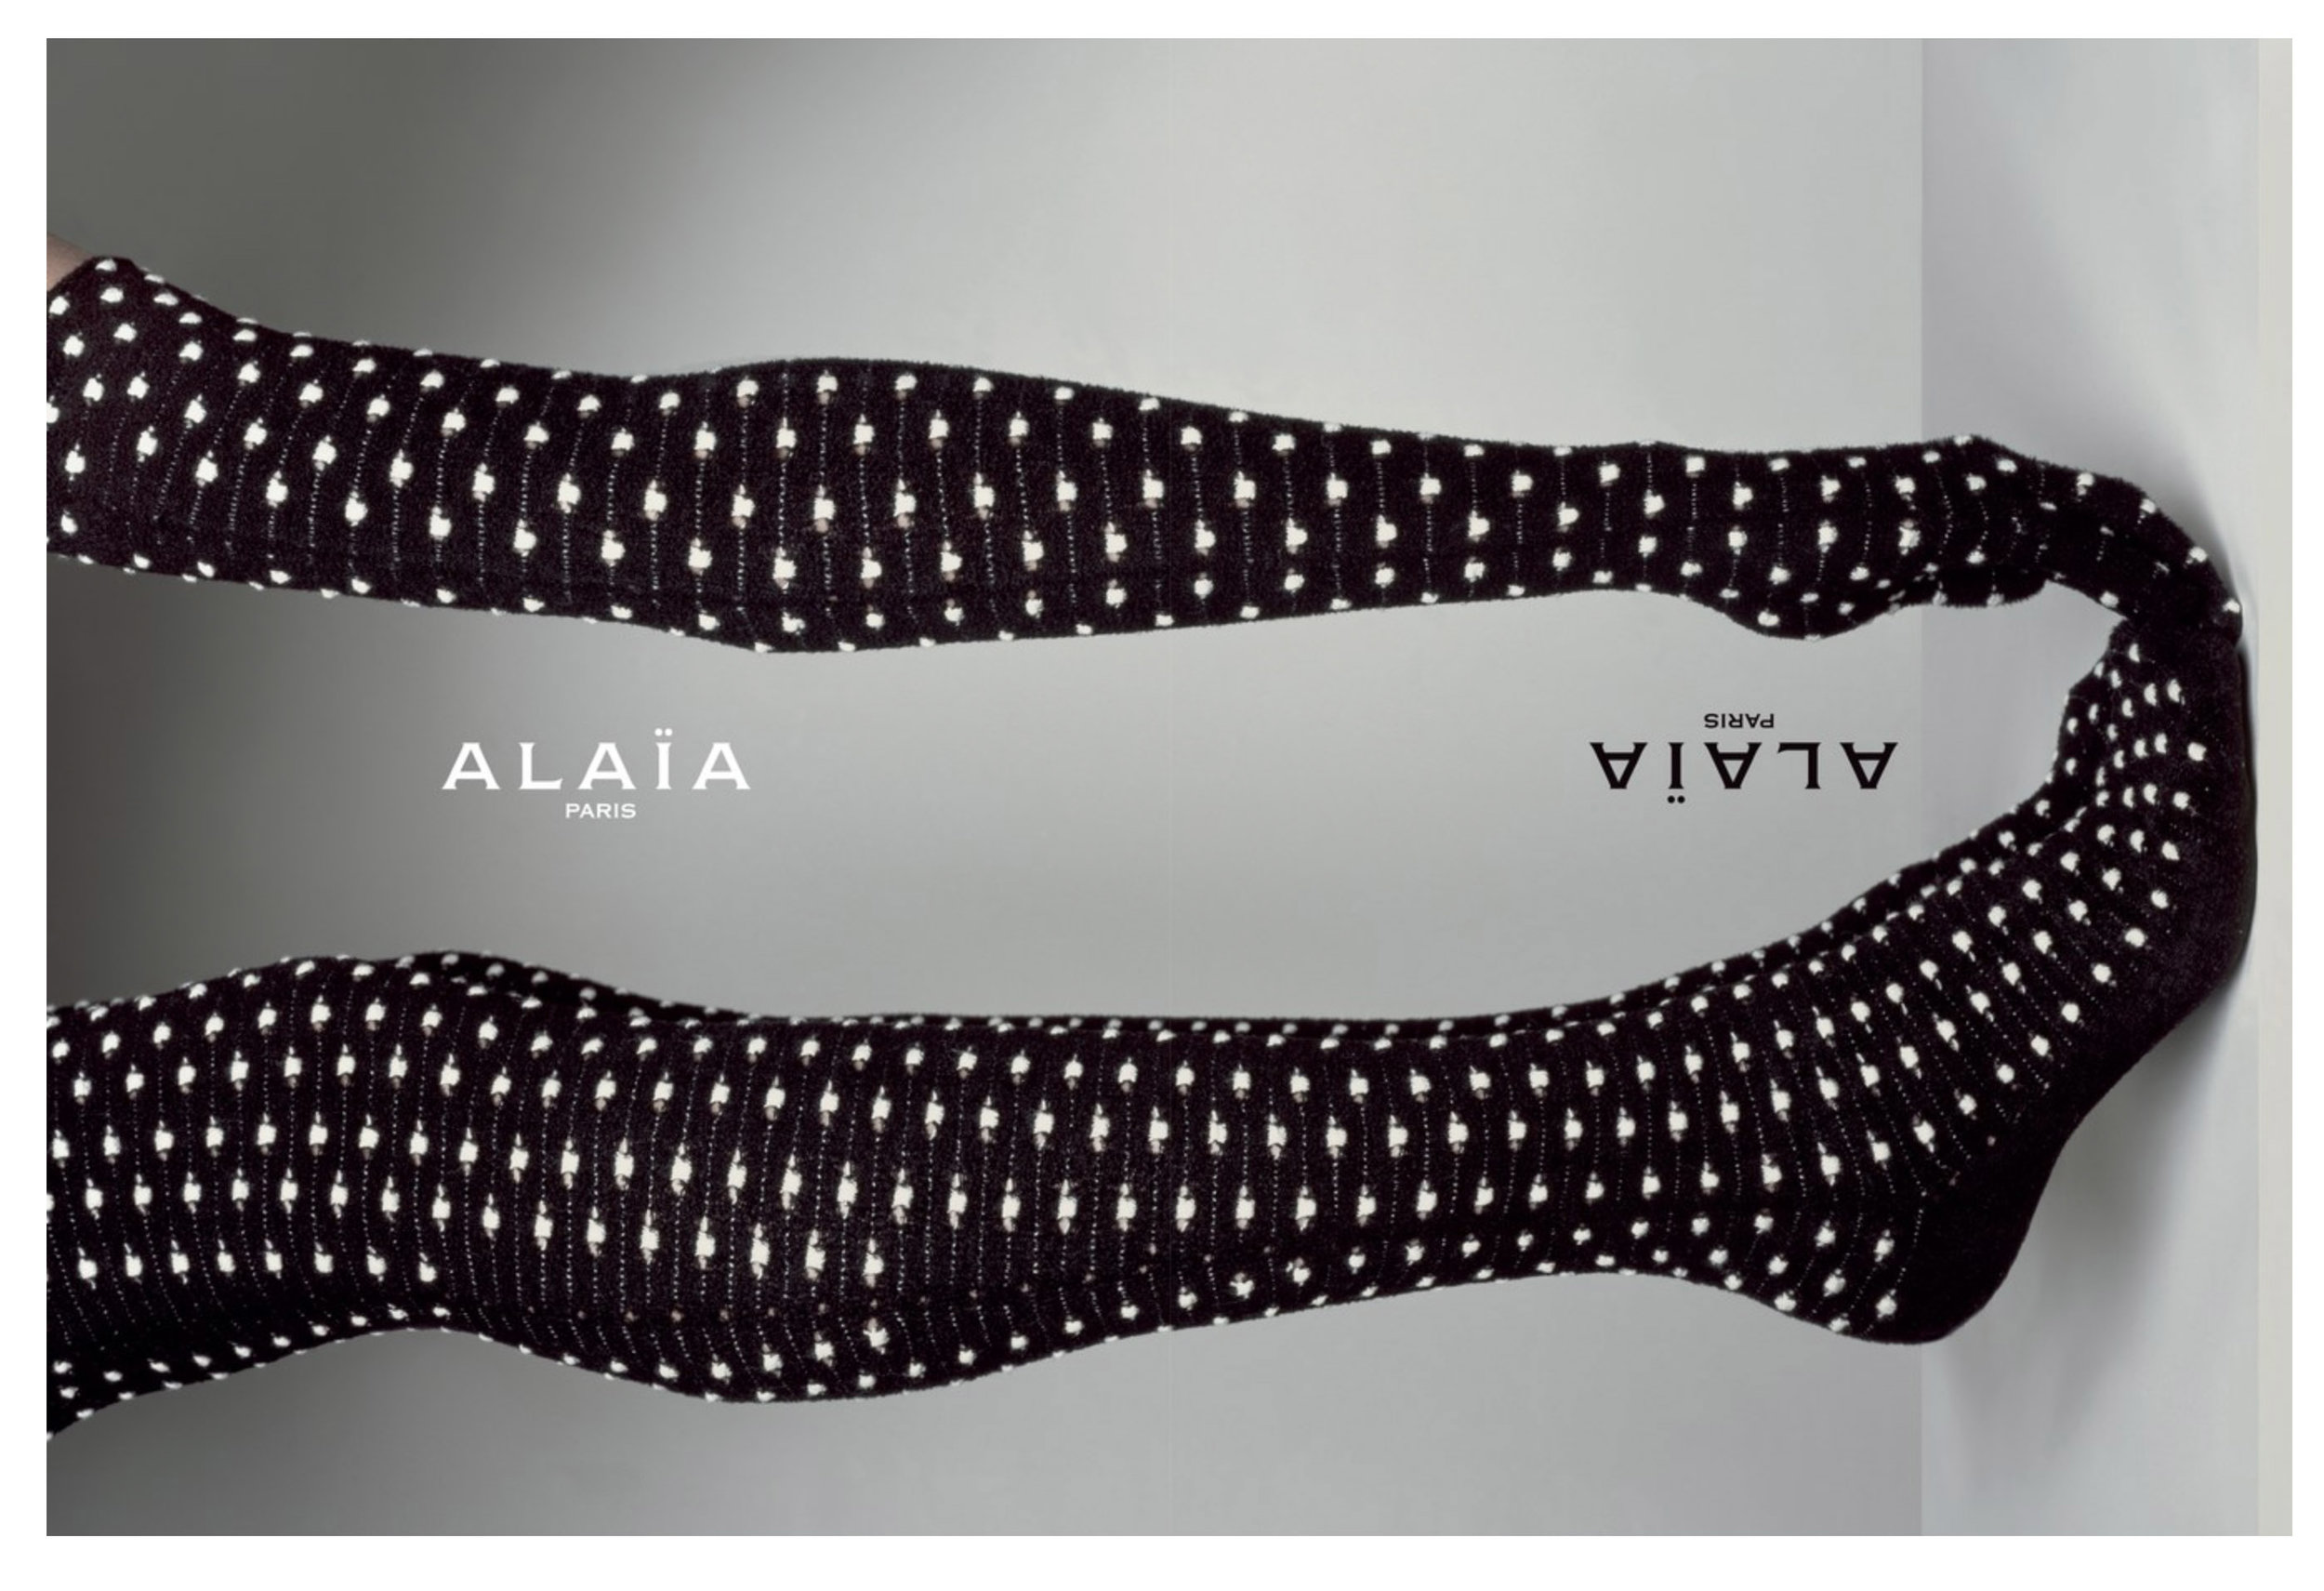 #alaia #campaign #brigitteniedermair #fashion #carineroitfeld #jimkaemmerling